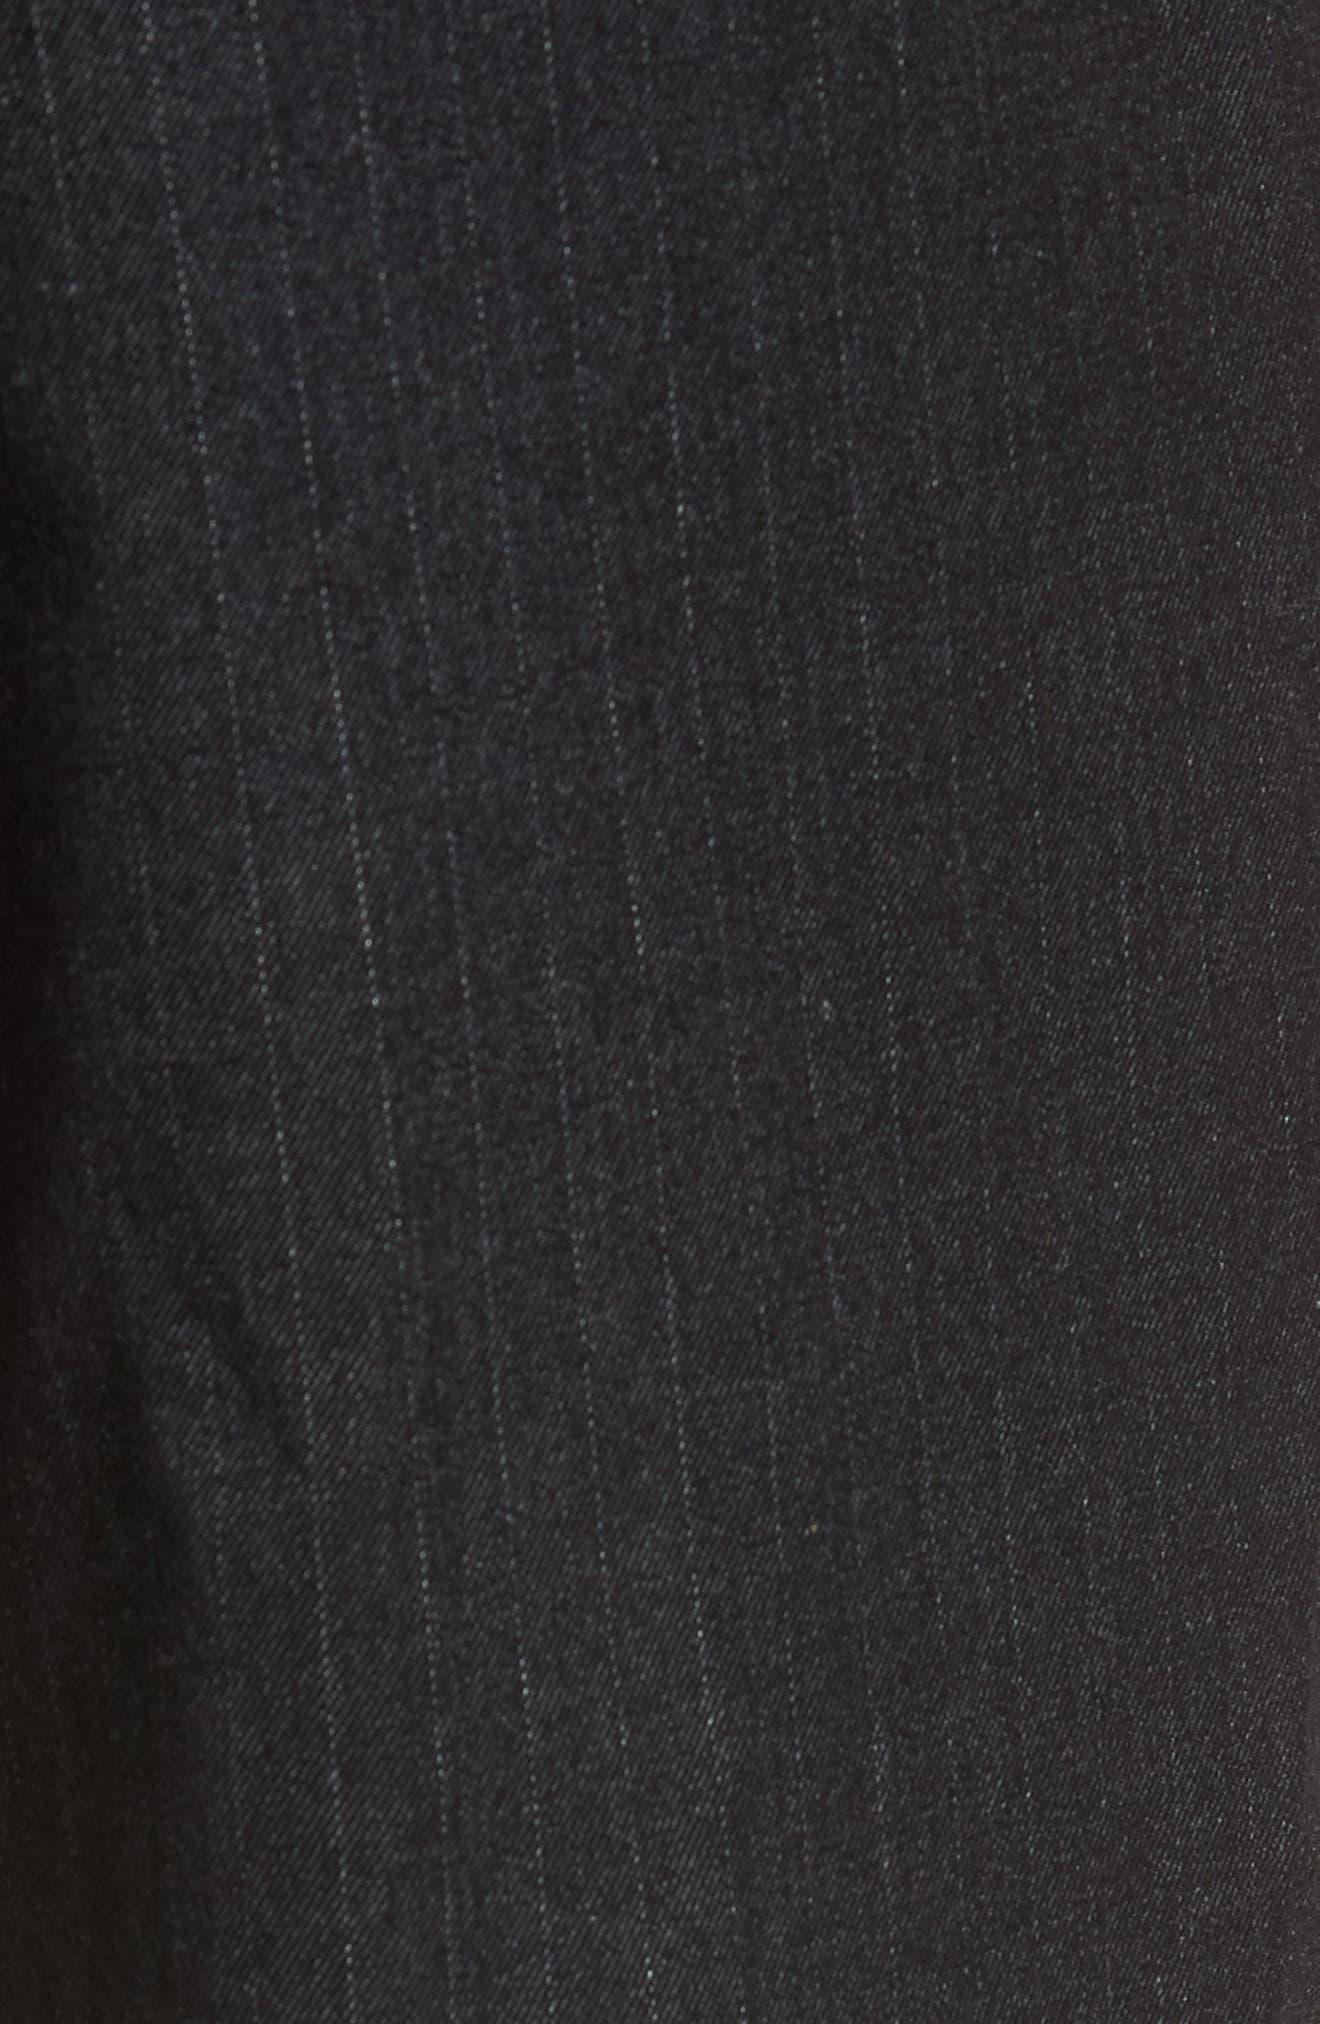 Marshall Slim Fit Pinstripe Pants,                             Alternate thumbnail 5, color,                             HEATHERED MELANGE BLACK